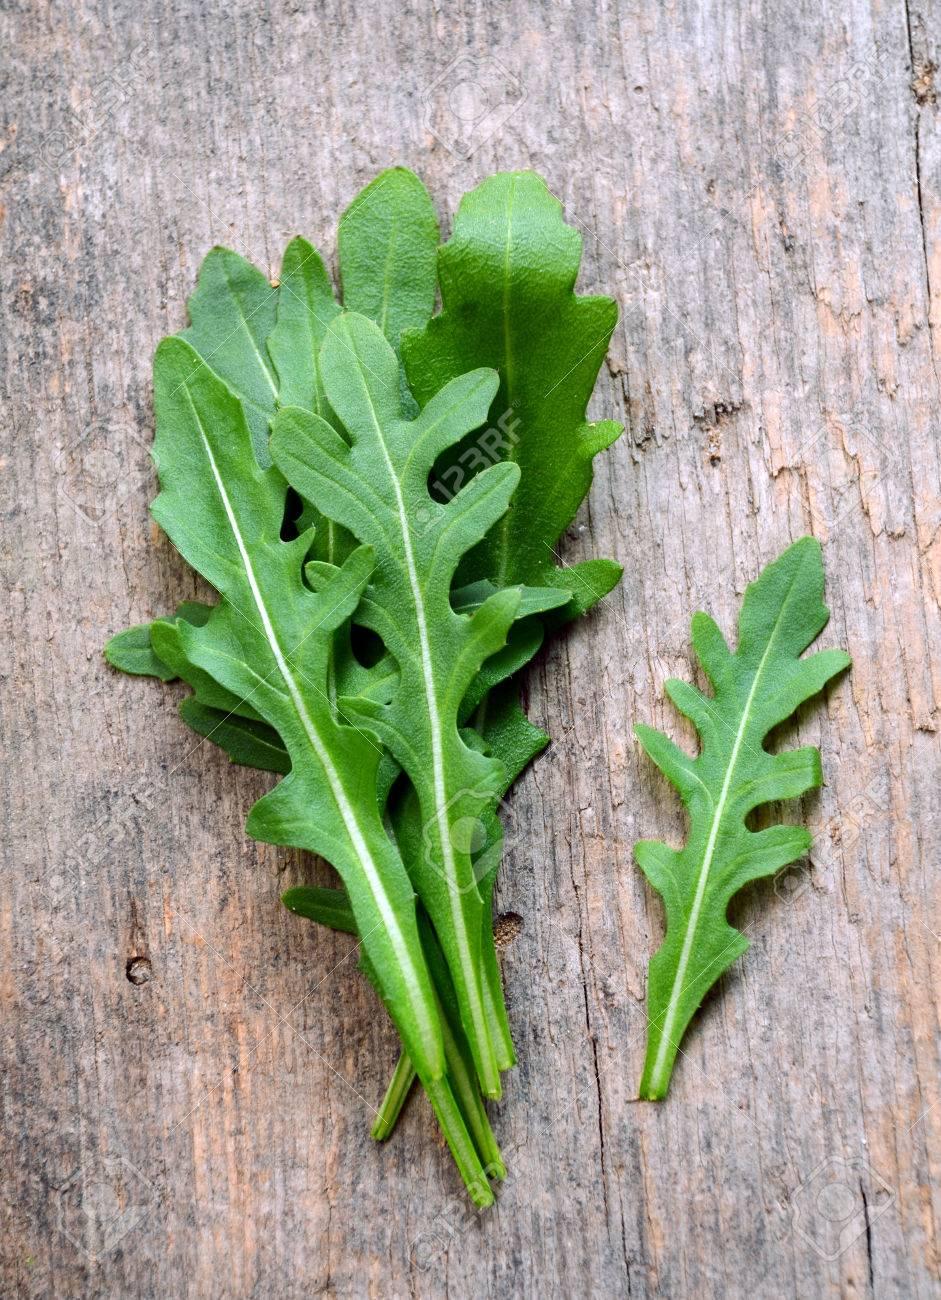 Fresh Arugula Salad Rocket Roquette Rucola Leaves Stock Photo 41258582